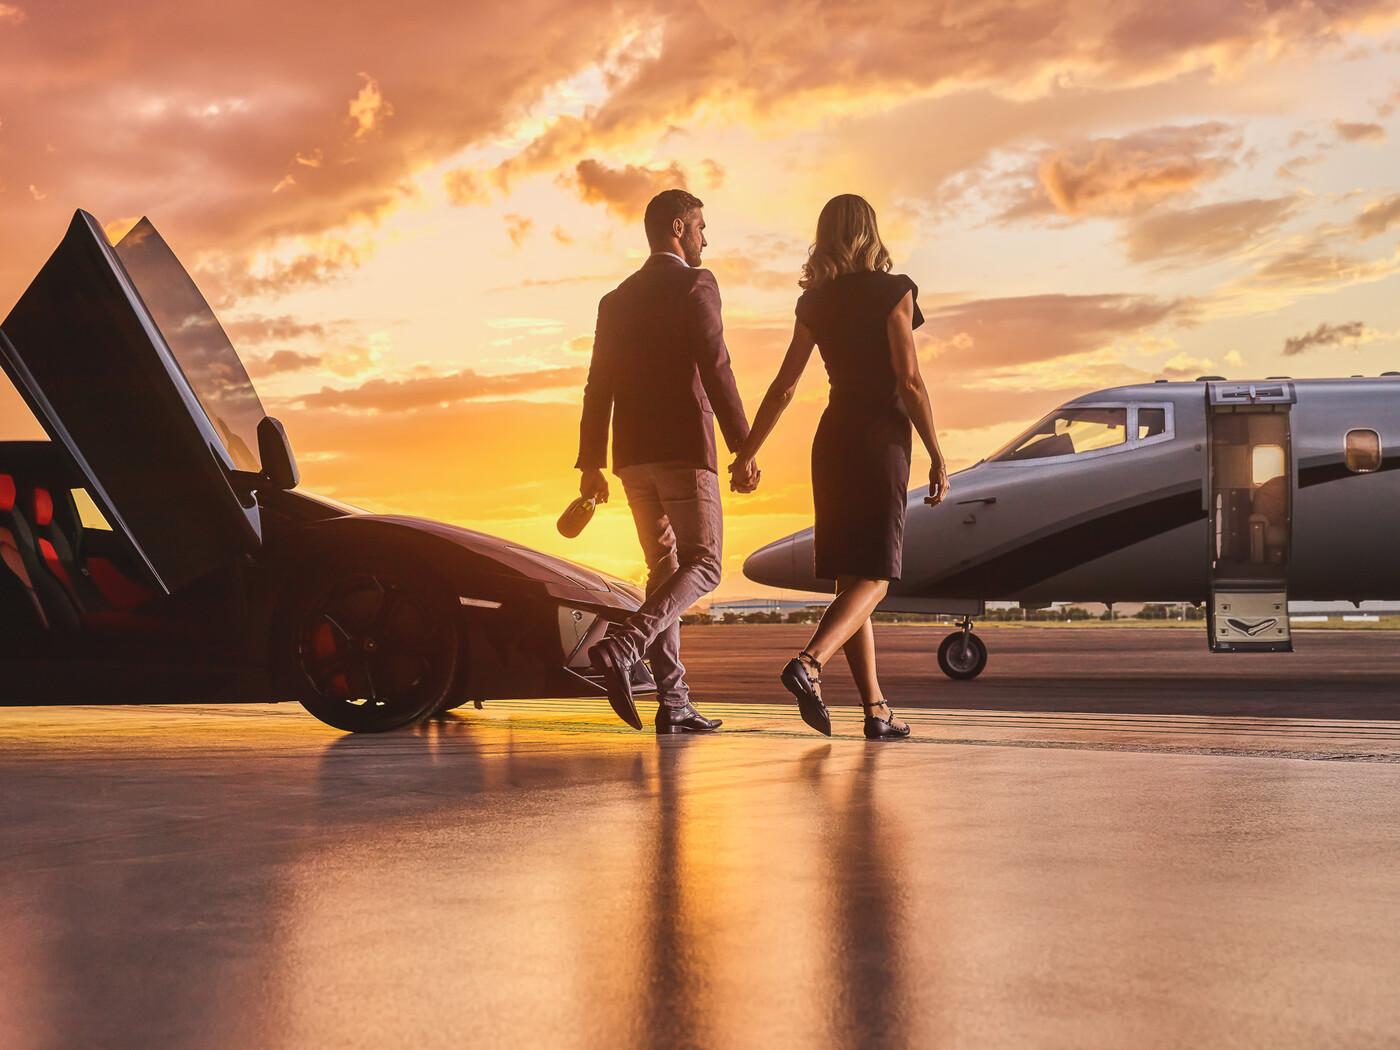 lamborghini-business-private-jet-married-couple-23.jpg